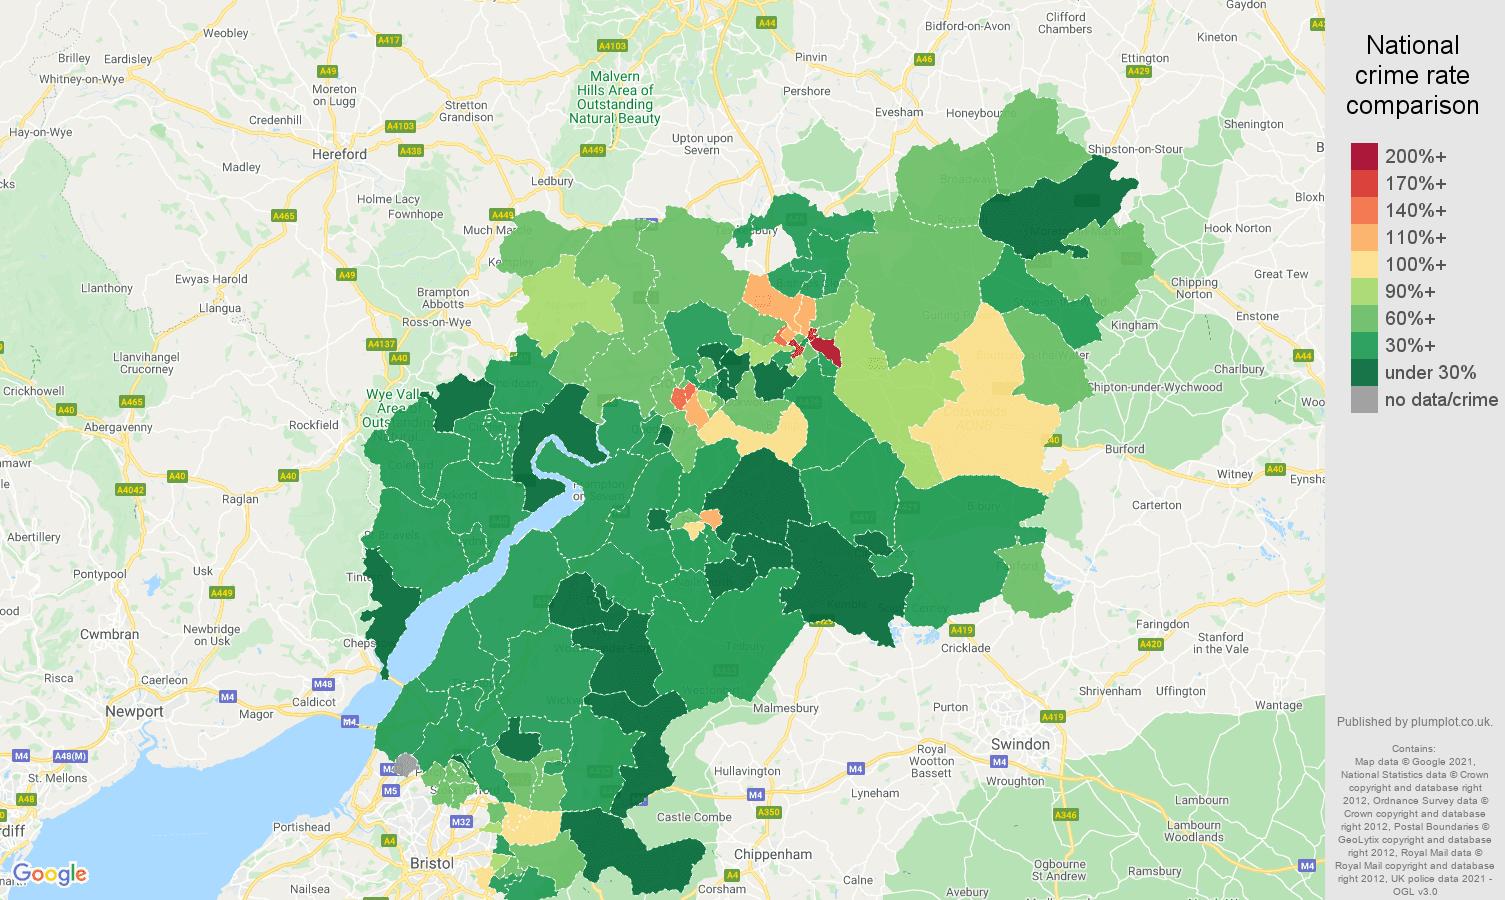 Gloucestershire vehicle crime rate comparison map